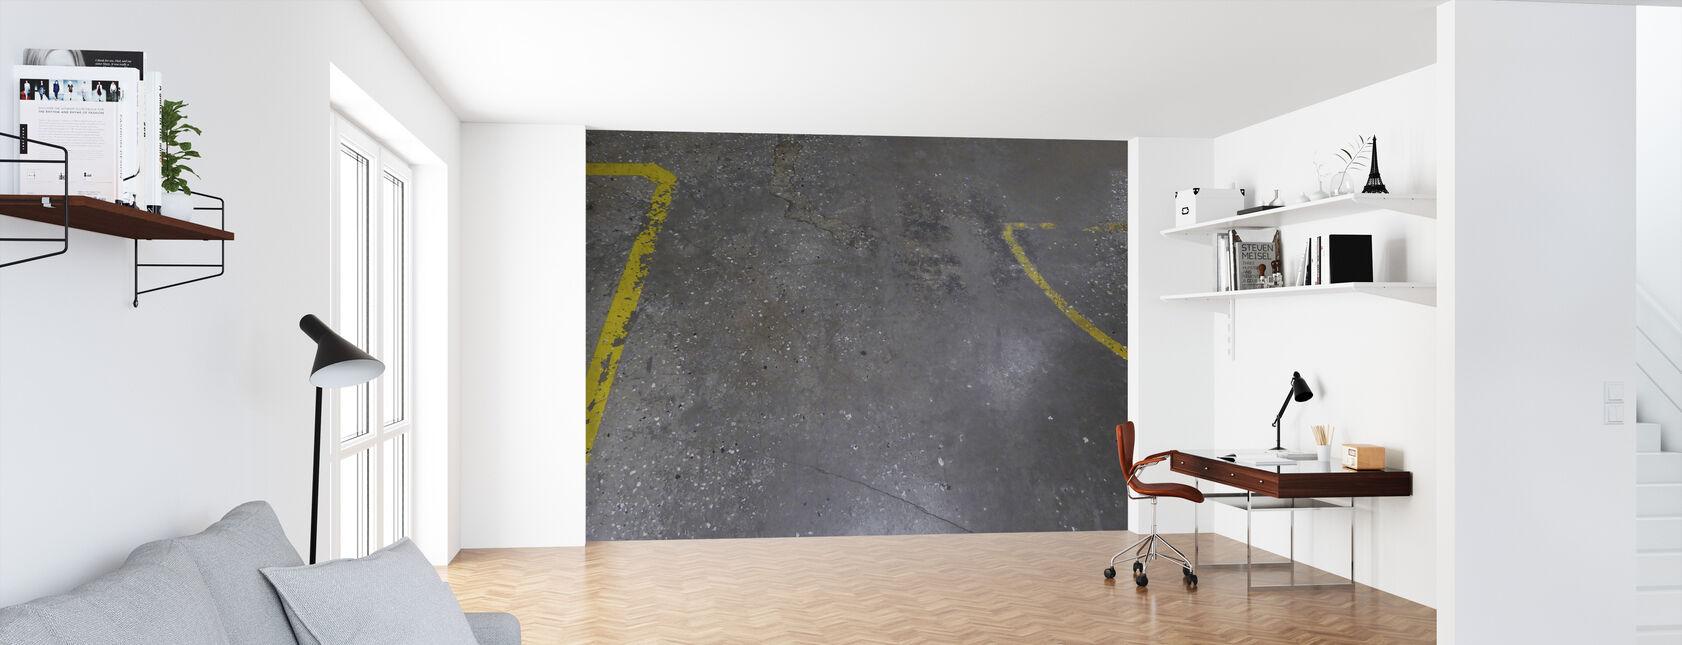 Concrete Floor on Wall 4 - Wallpaper - Office